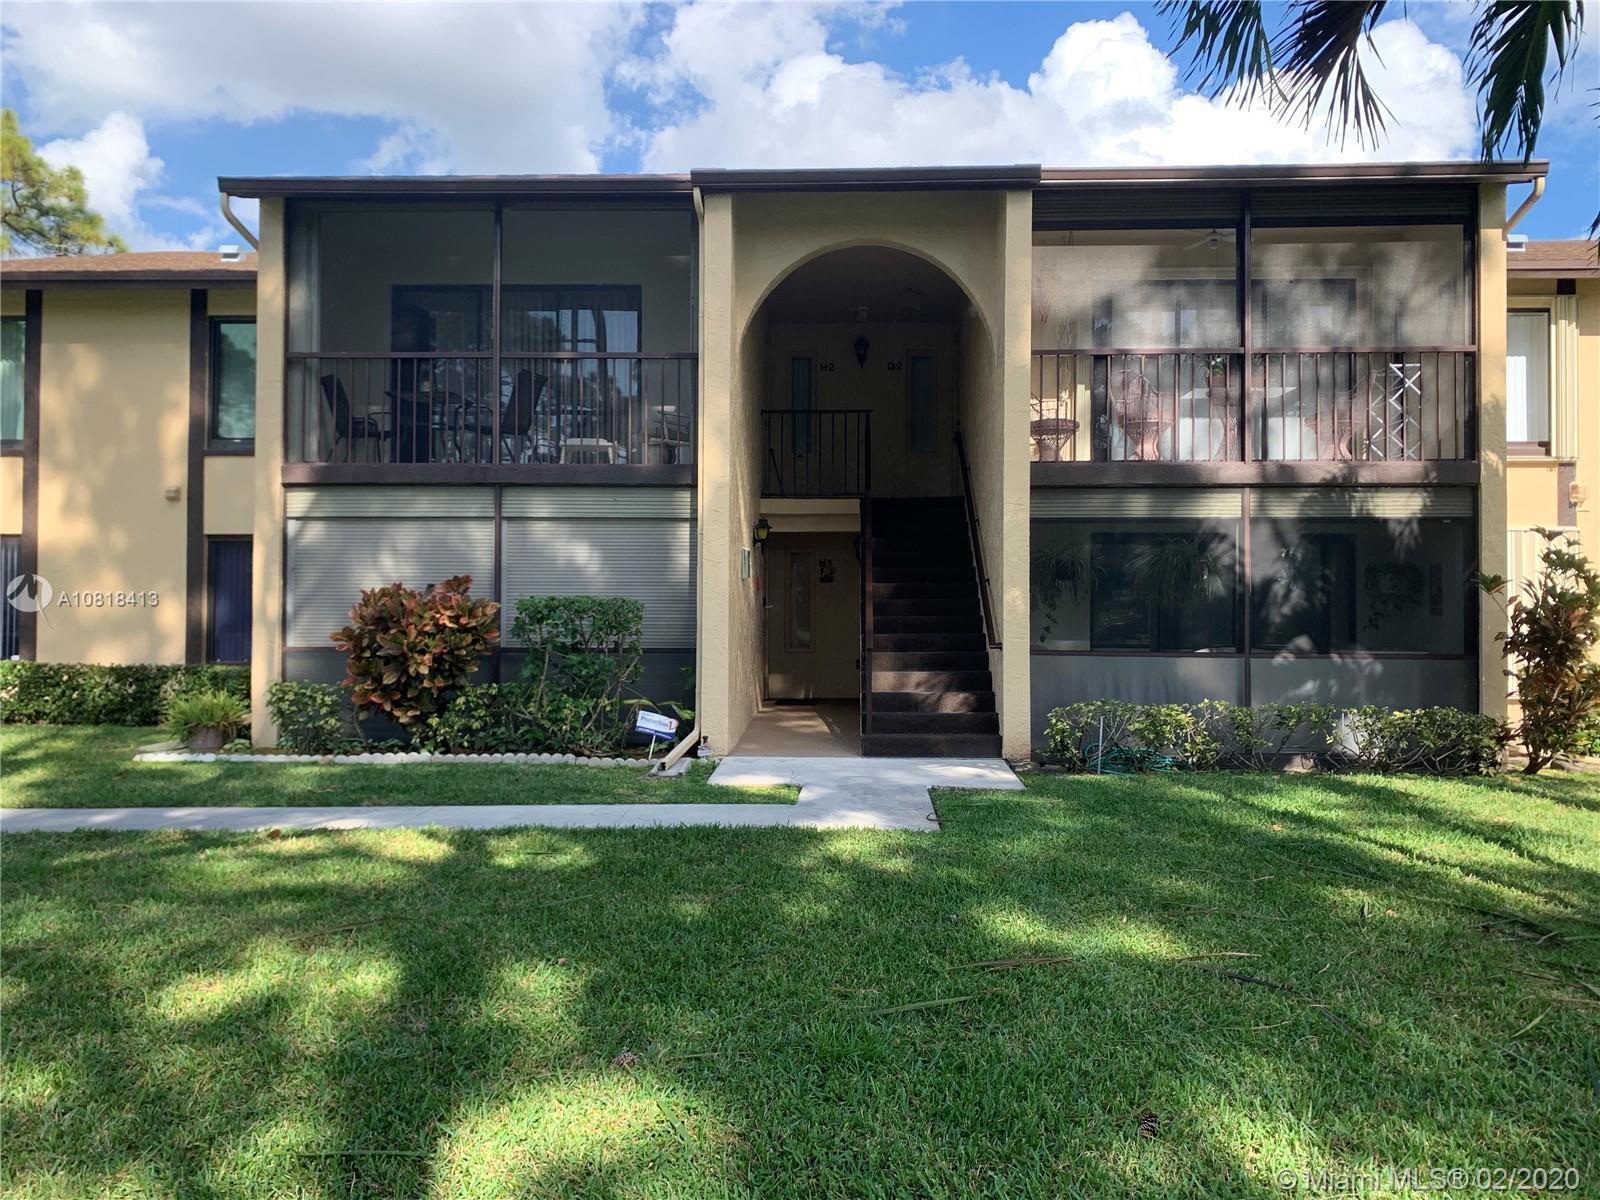 822 Sky Pine Way H1, Green Acres, FL 33415